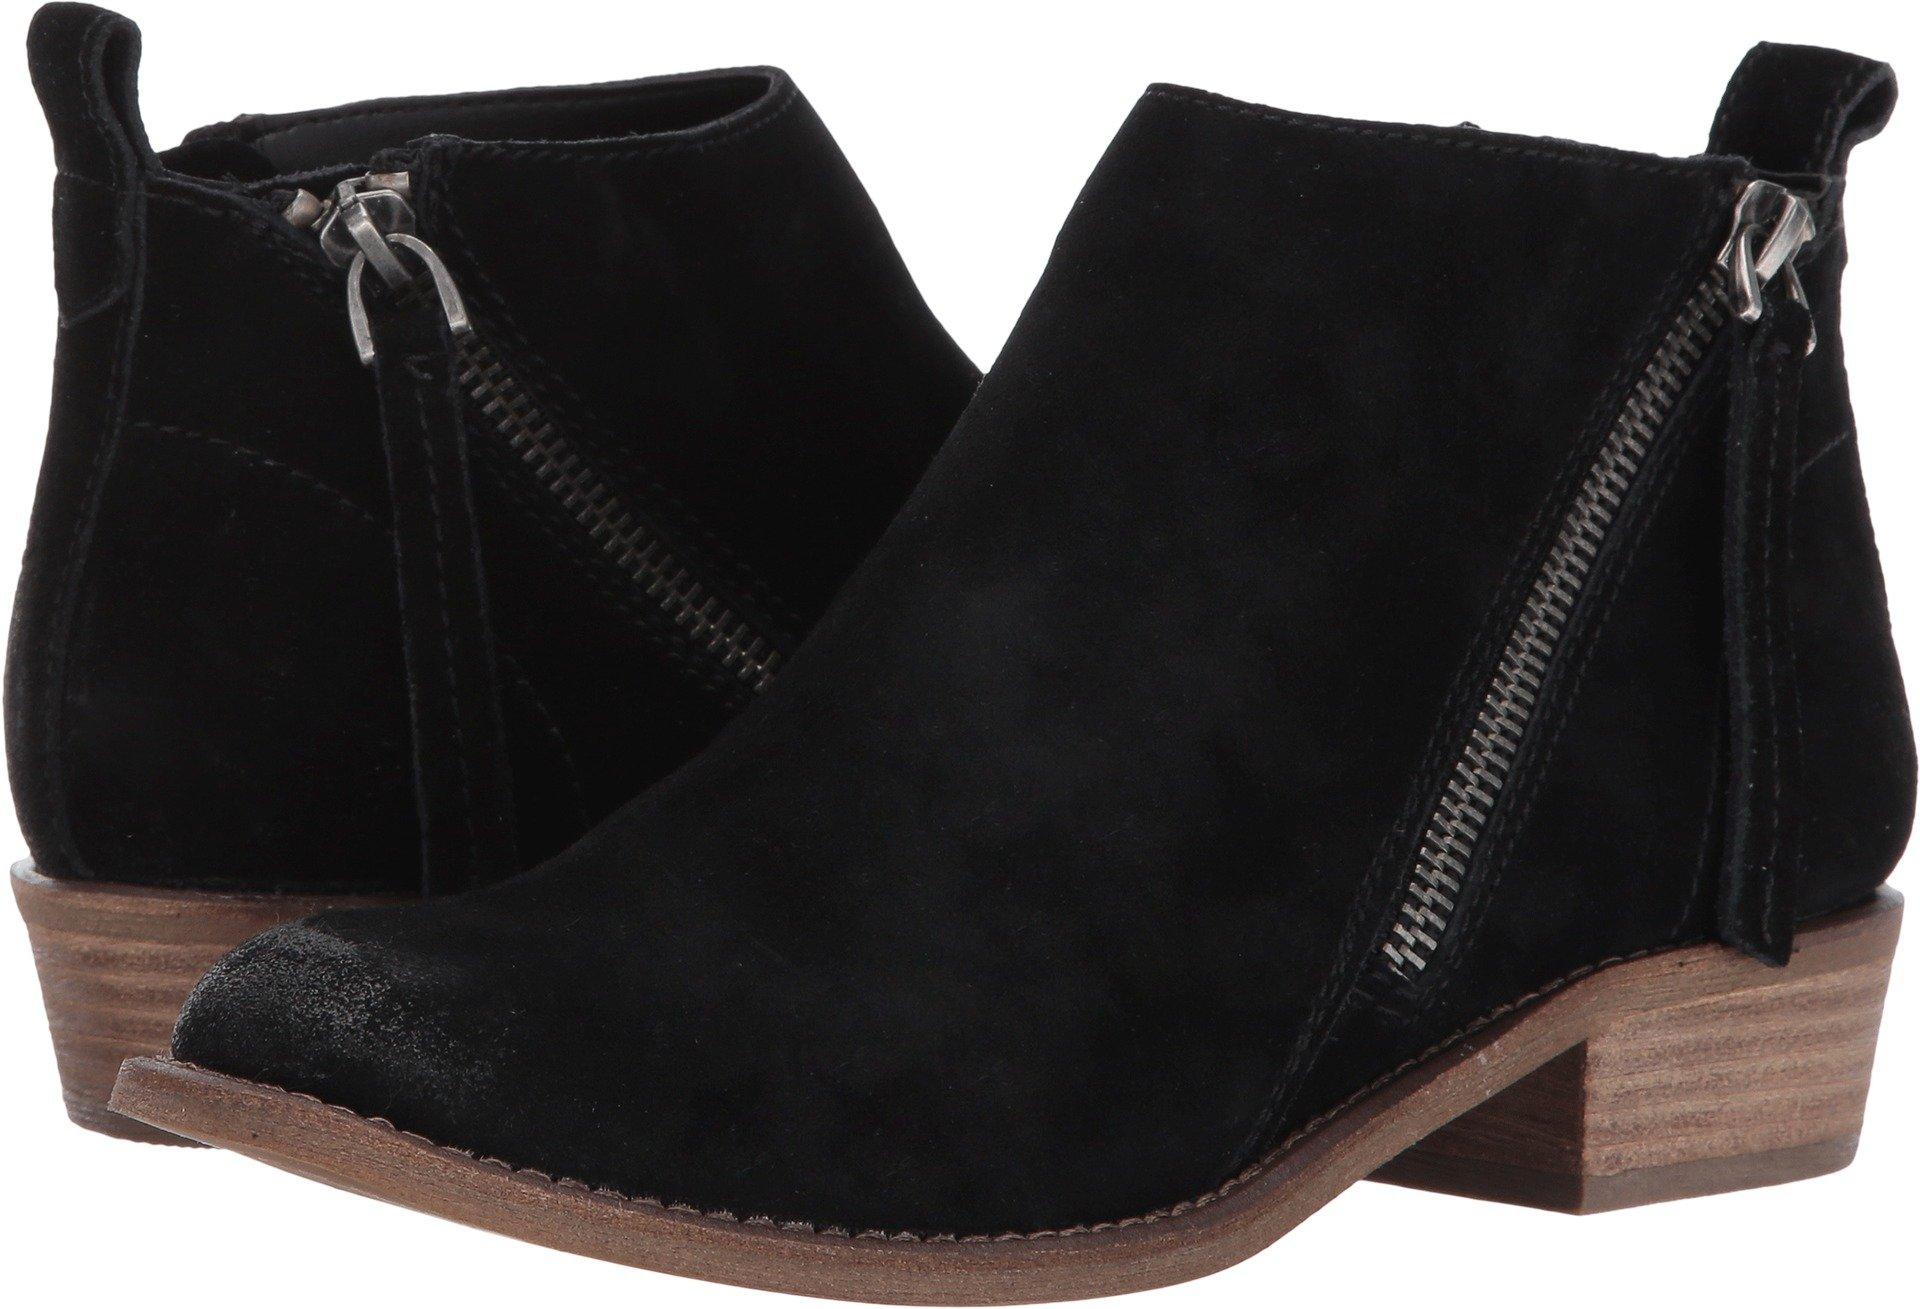 Dolce Vita Women's Sibil Ankle Bootie, Black Suede, 6.5 M US